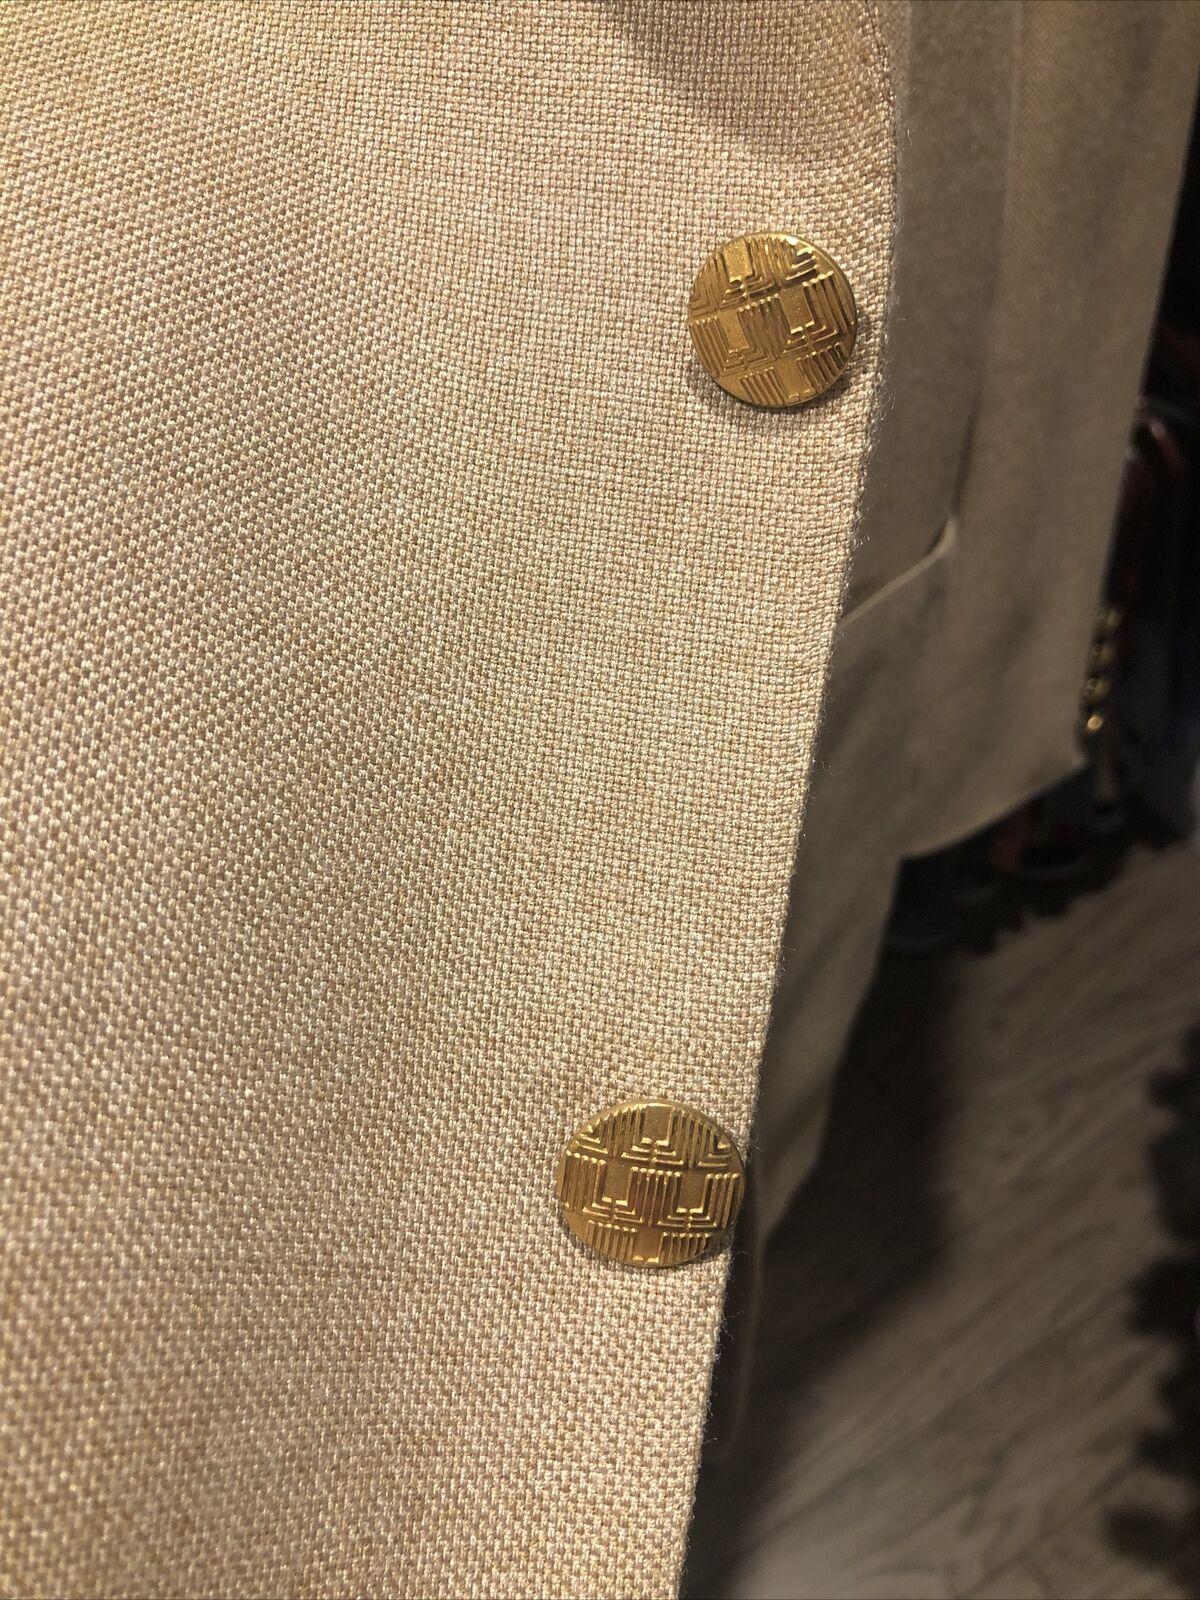 Vintage Lanvin Linen Blazer jacket Men's 42s  197… - image 8